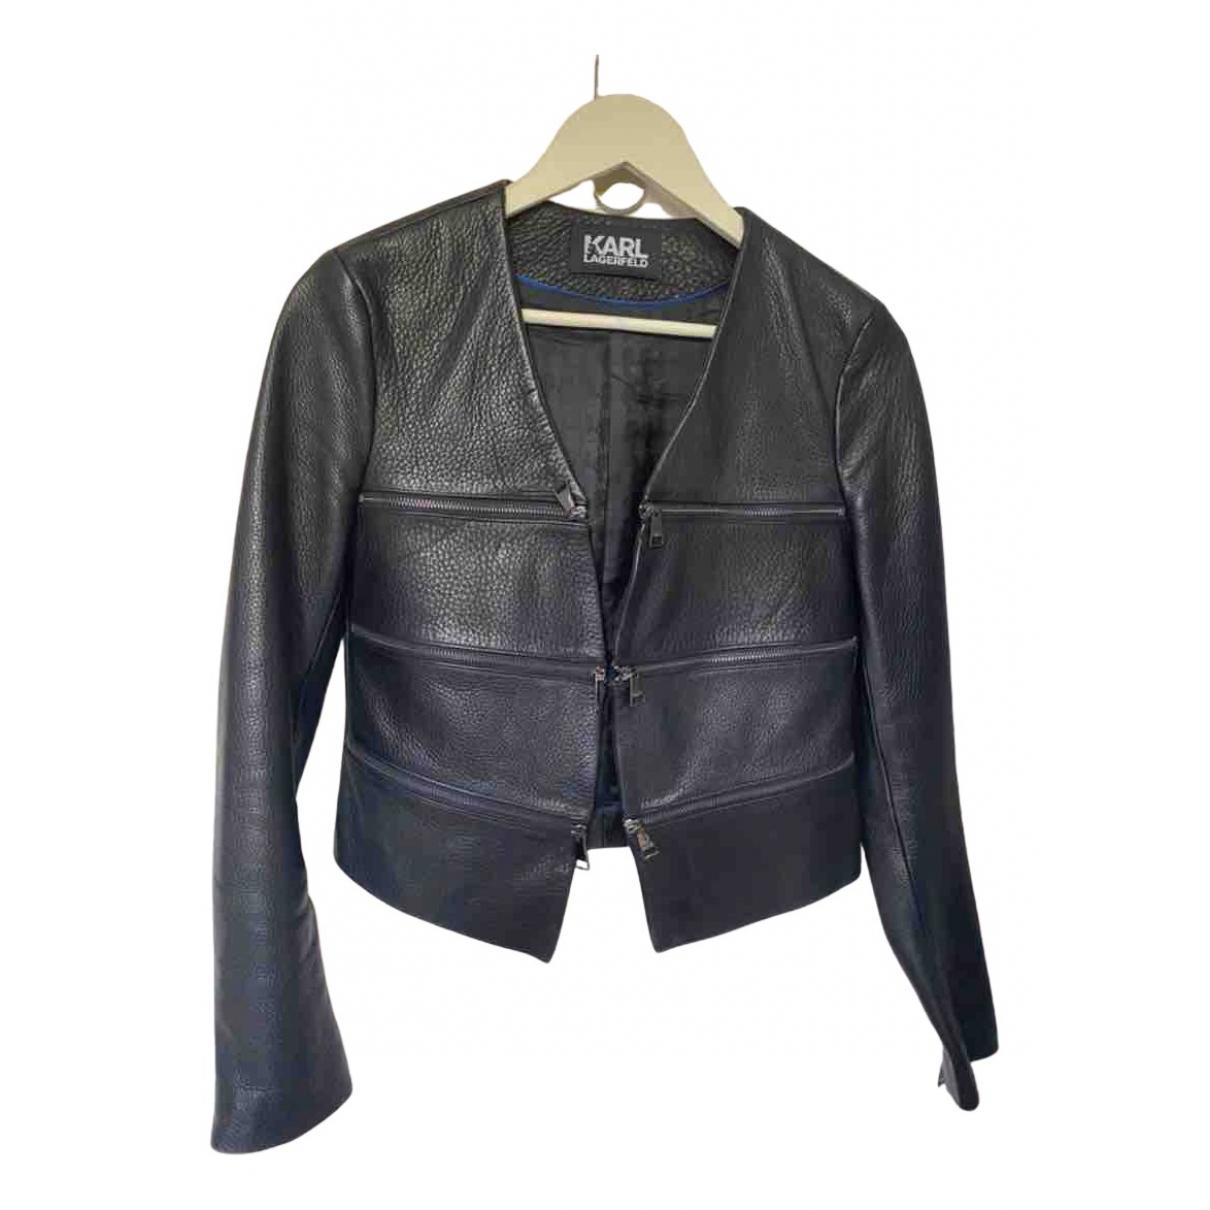 Karl Lagerfeld N Black Leather Leather jacket for Women 38 FR